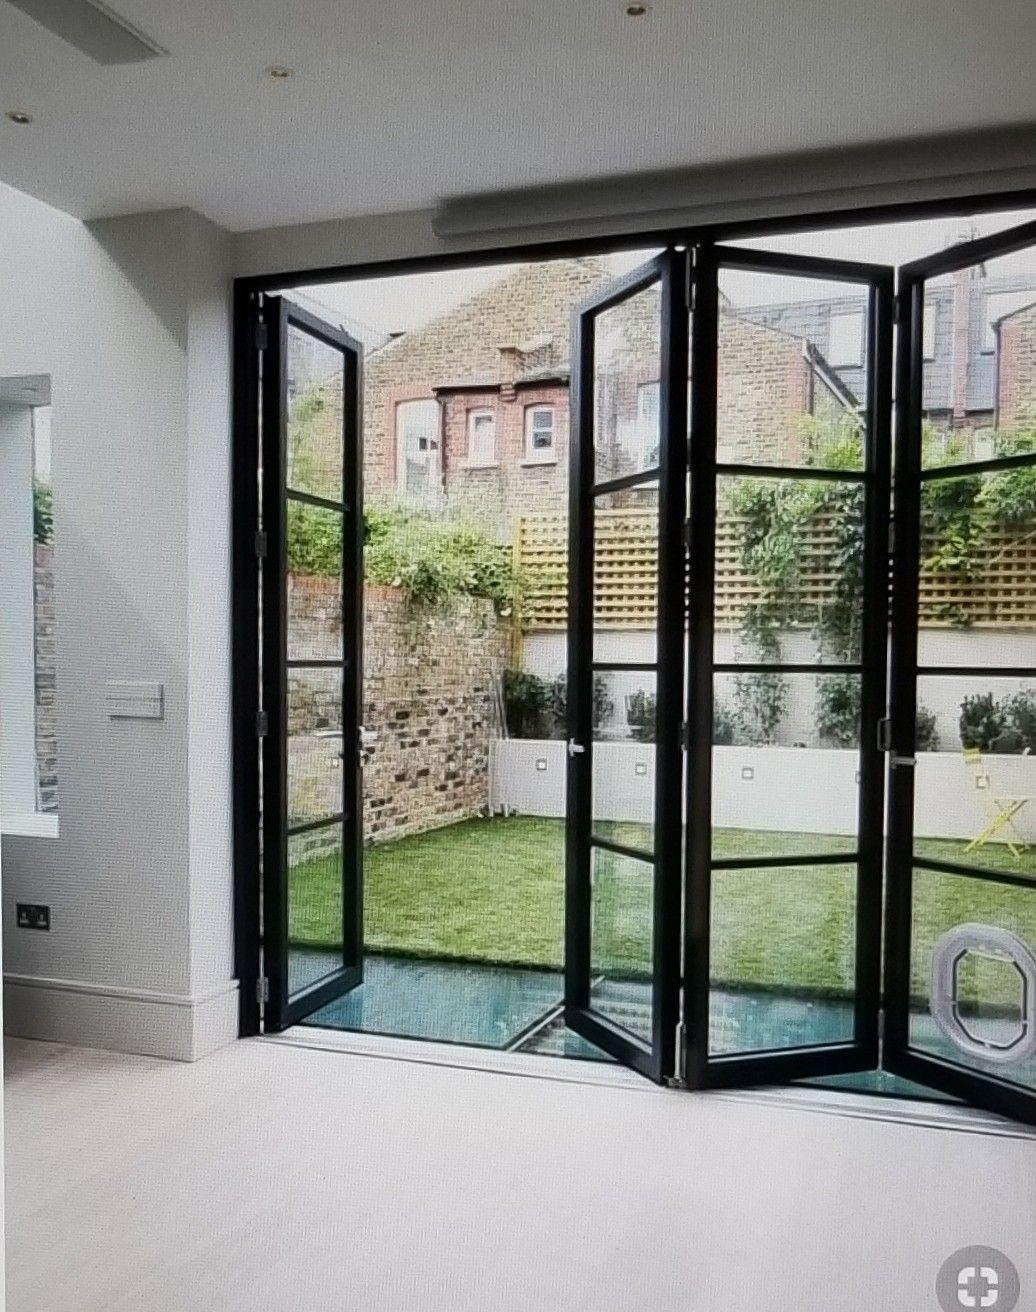 48 inch interior french doors lowes on pin by mili madriz on great room windows and doors glass doors patio house design door design modern glass doors patio